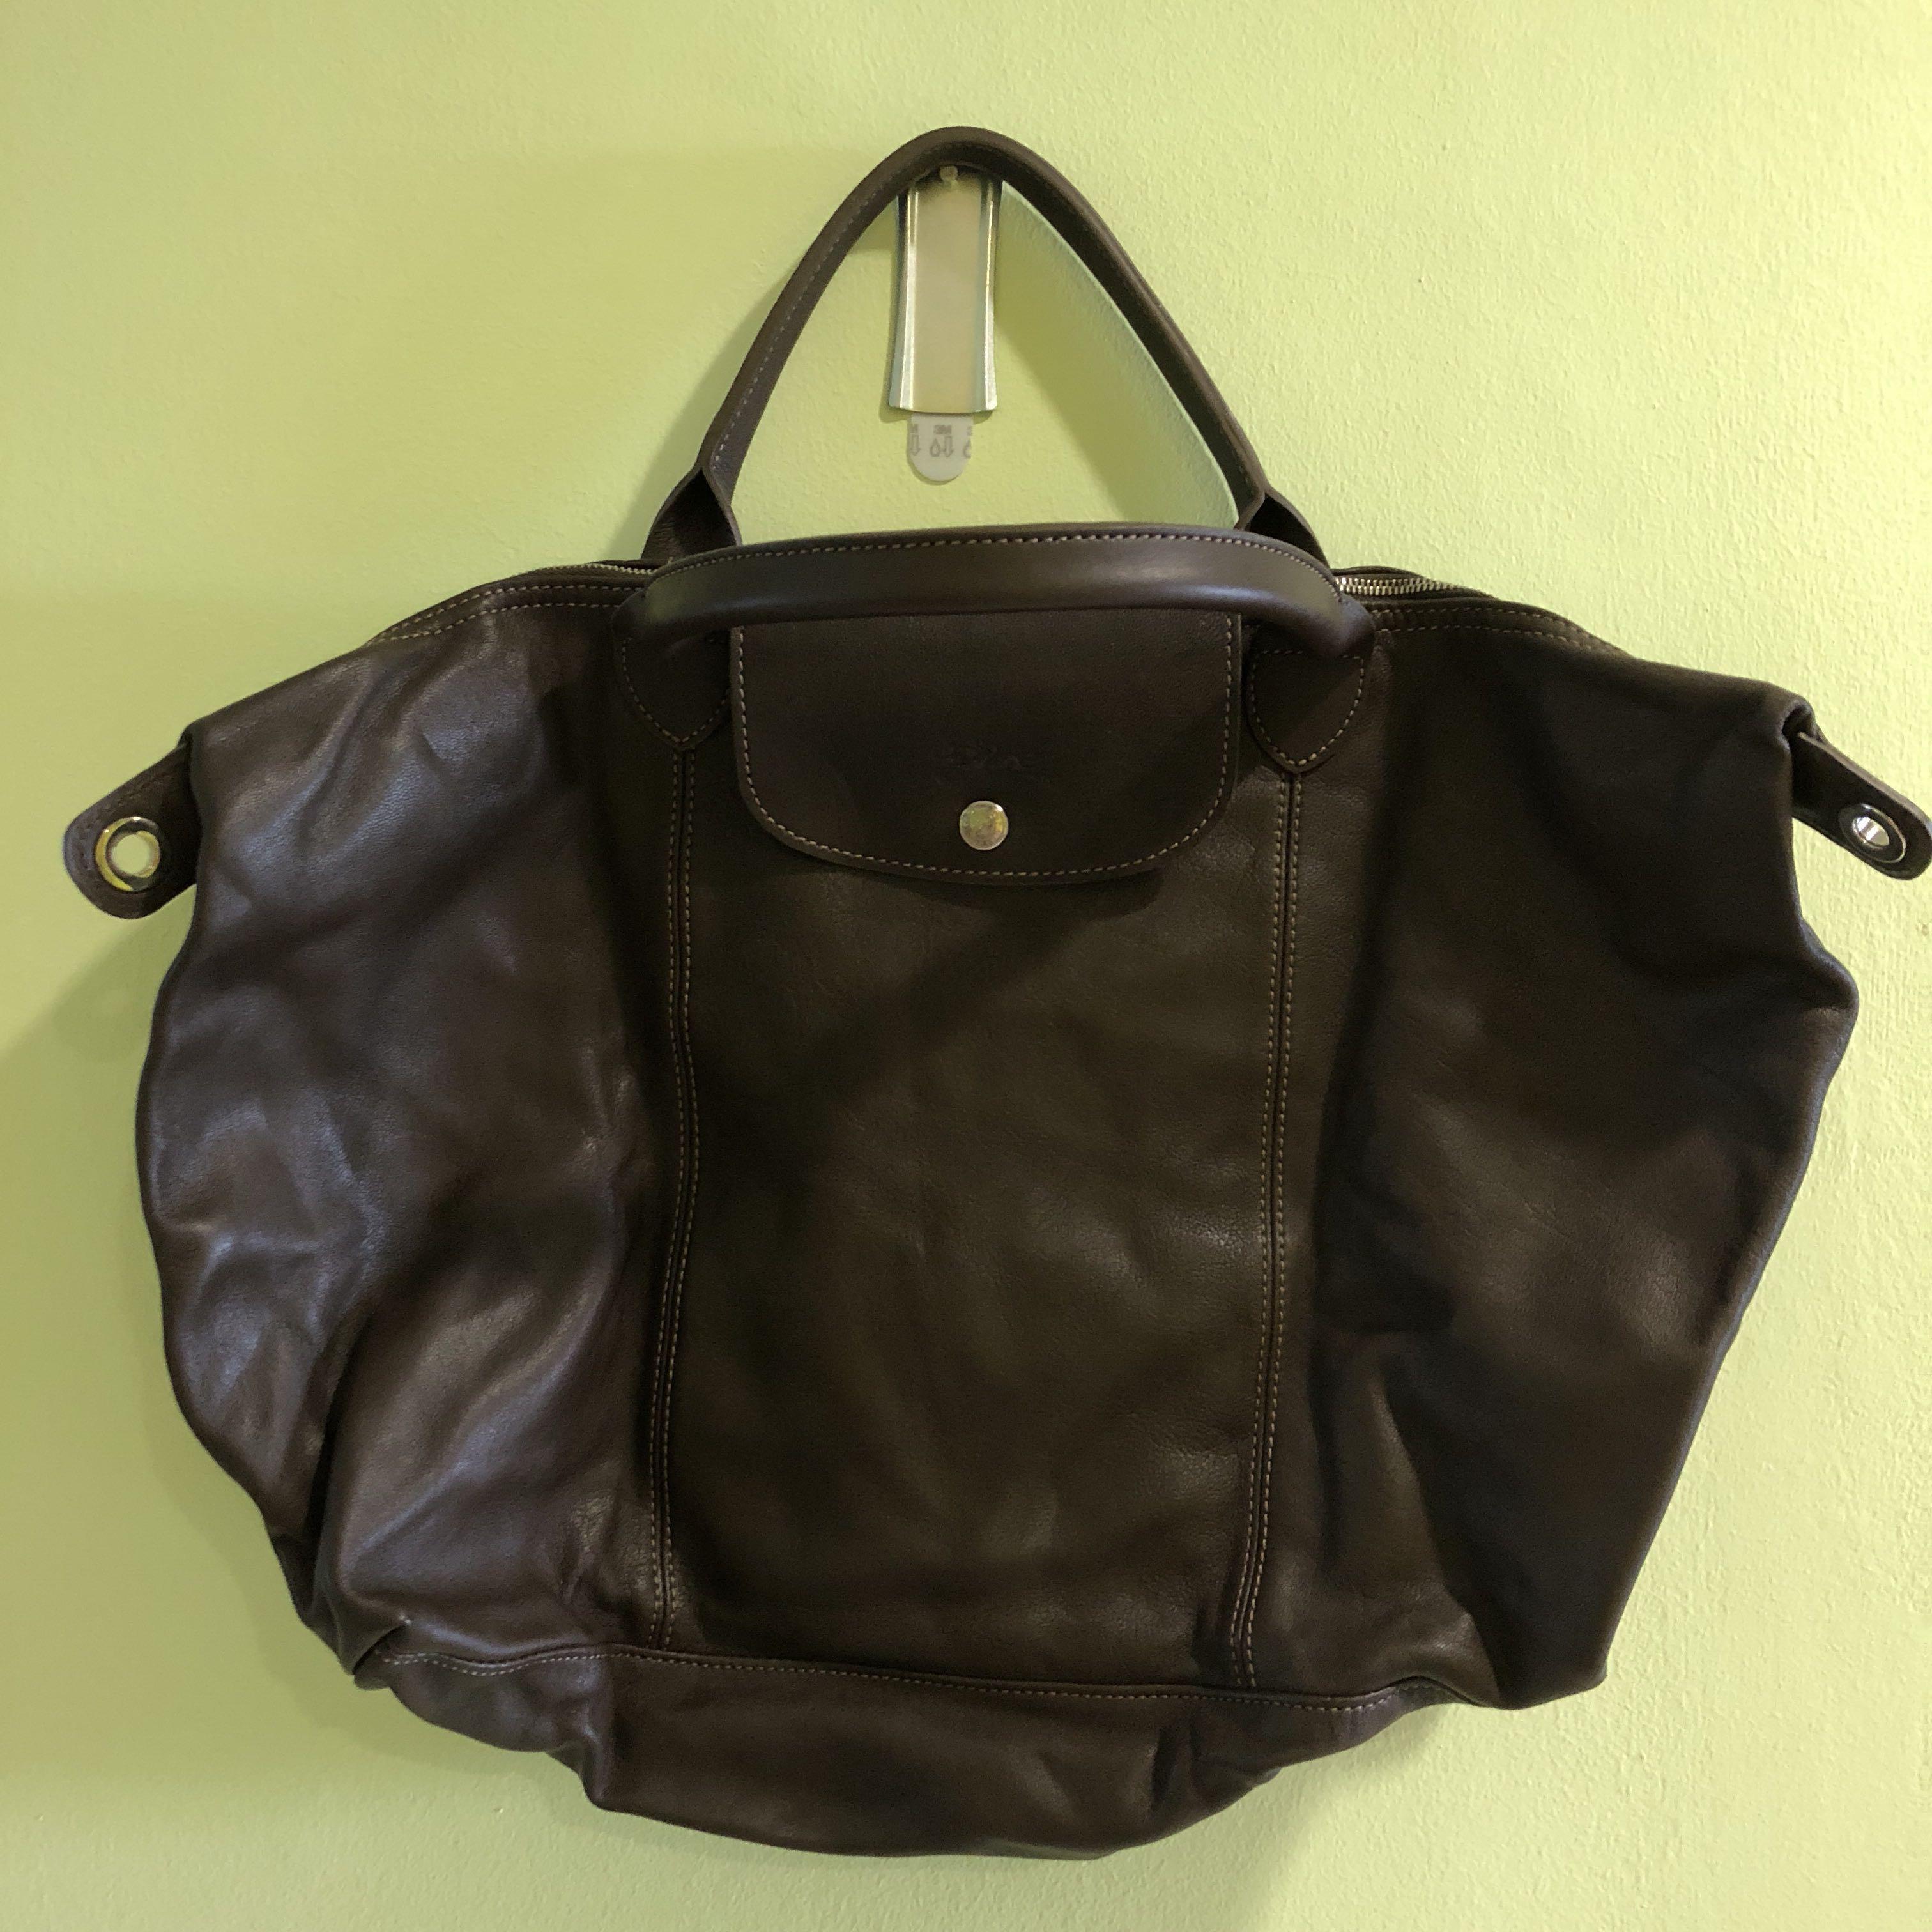 965556d0ae Longchamp Le Pliage Cuir leather medium tote bag, Women's Fashion ...